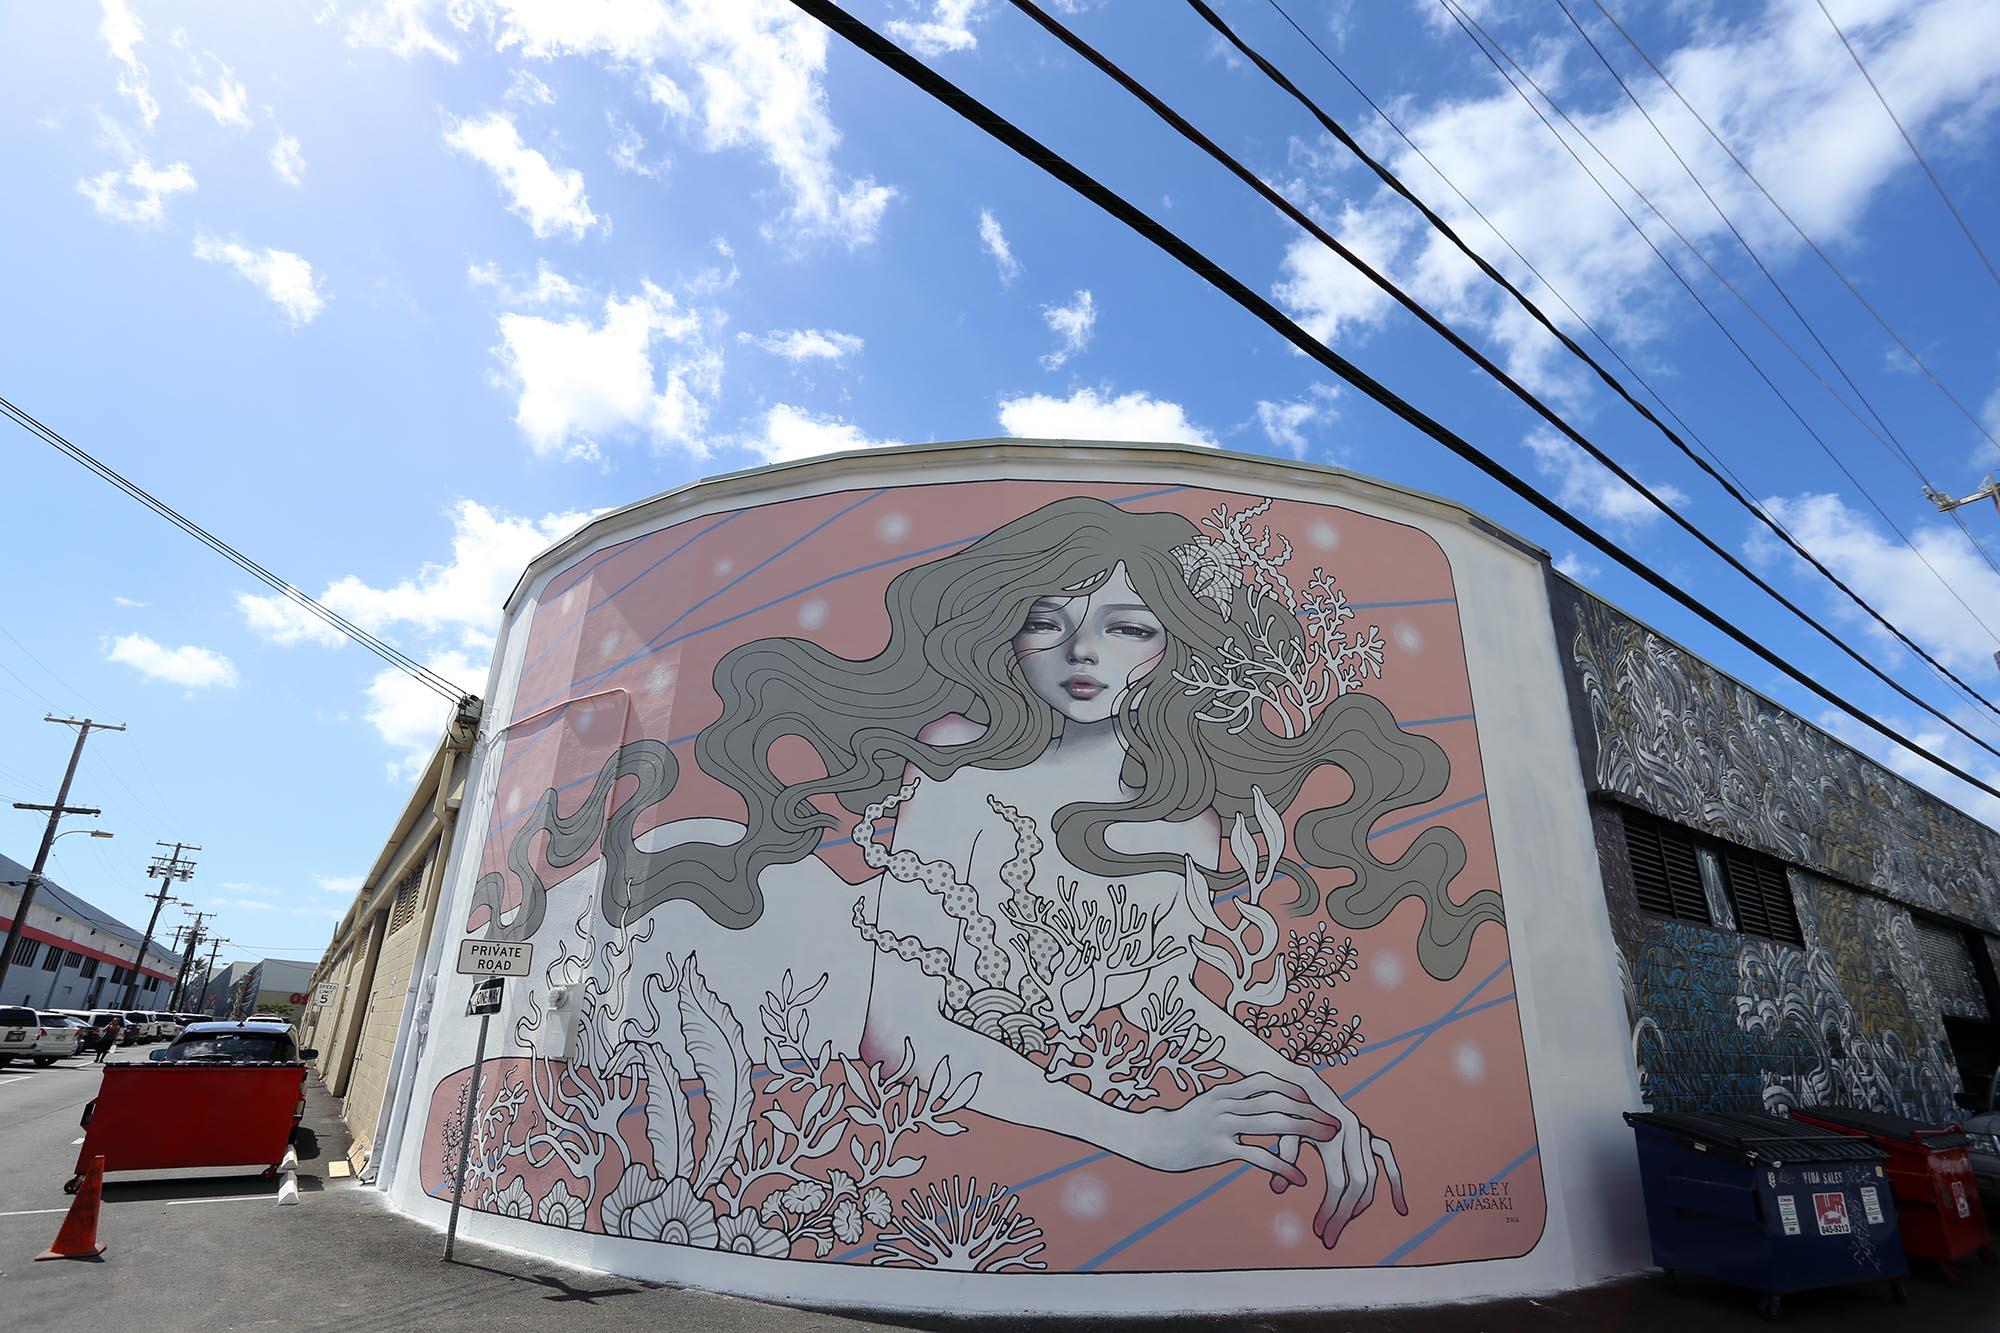 audrey_kawasaki_powwow-festival-grafite-mural-dionisio-arte (2)